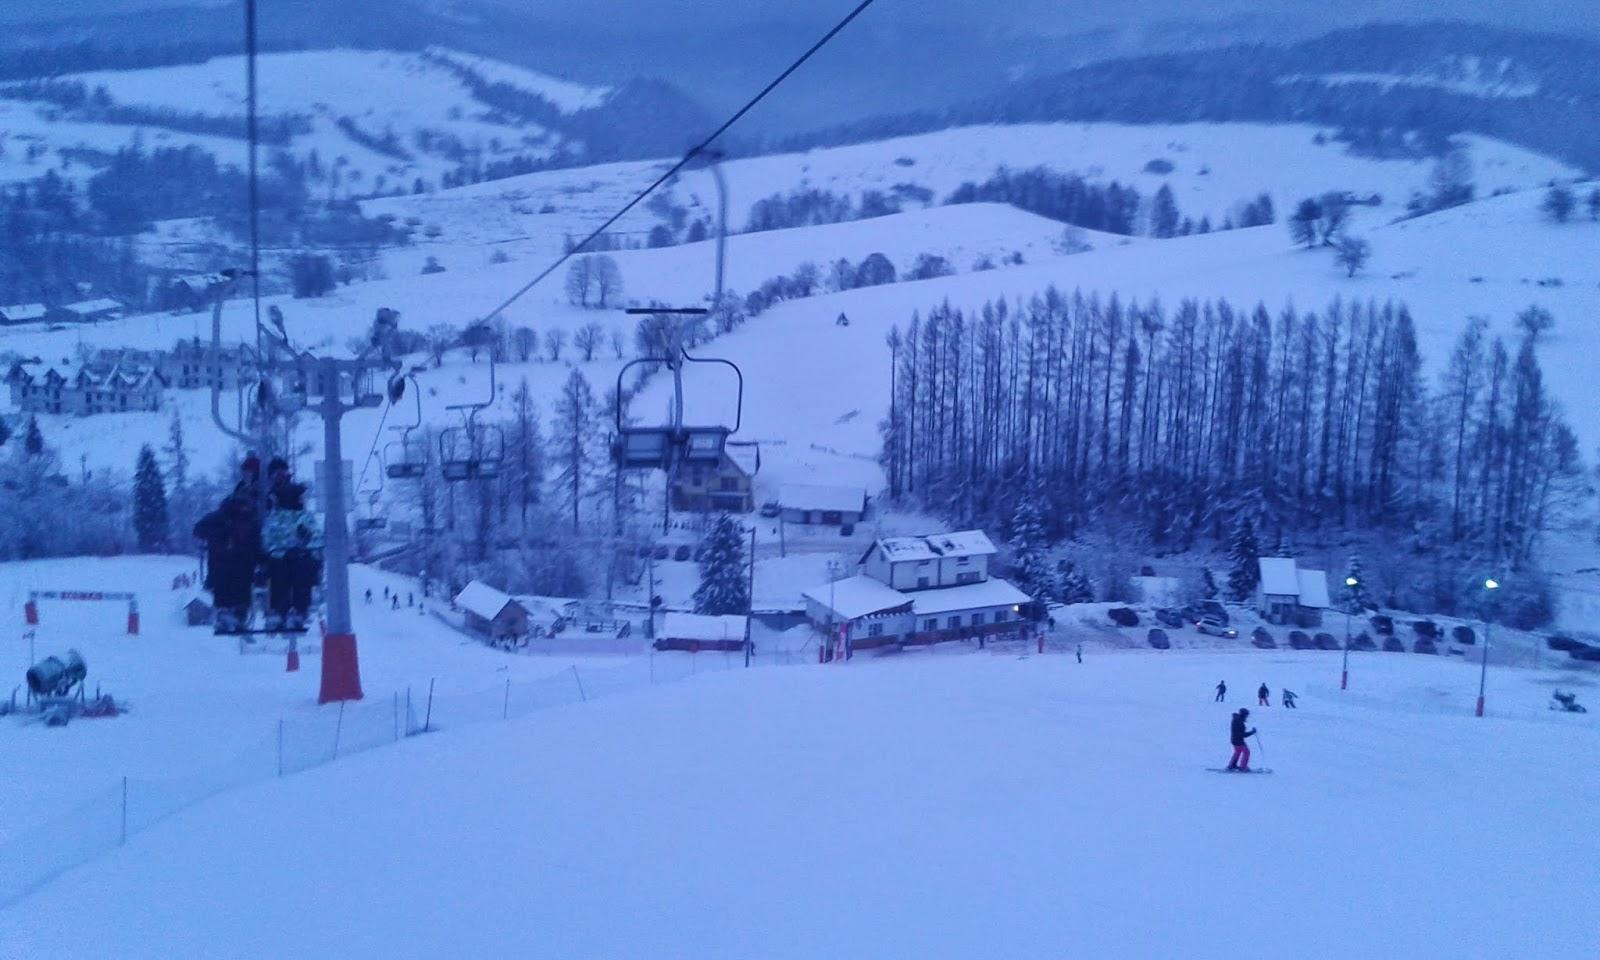 Arena narciarska Homole w Jaworkach